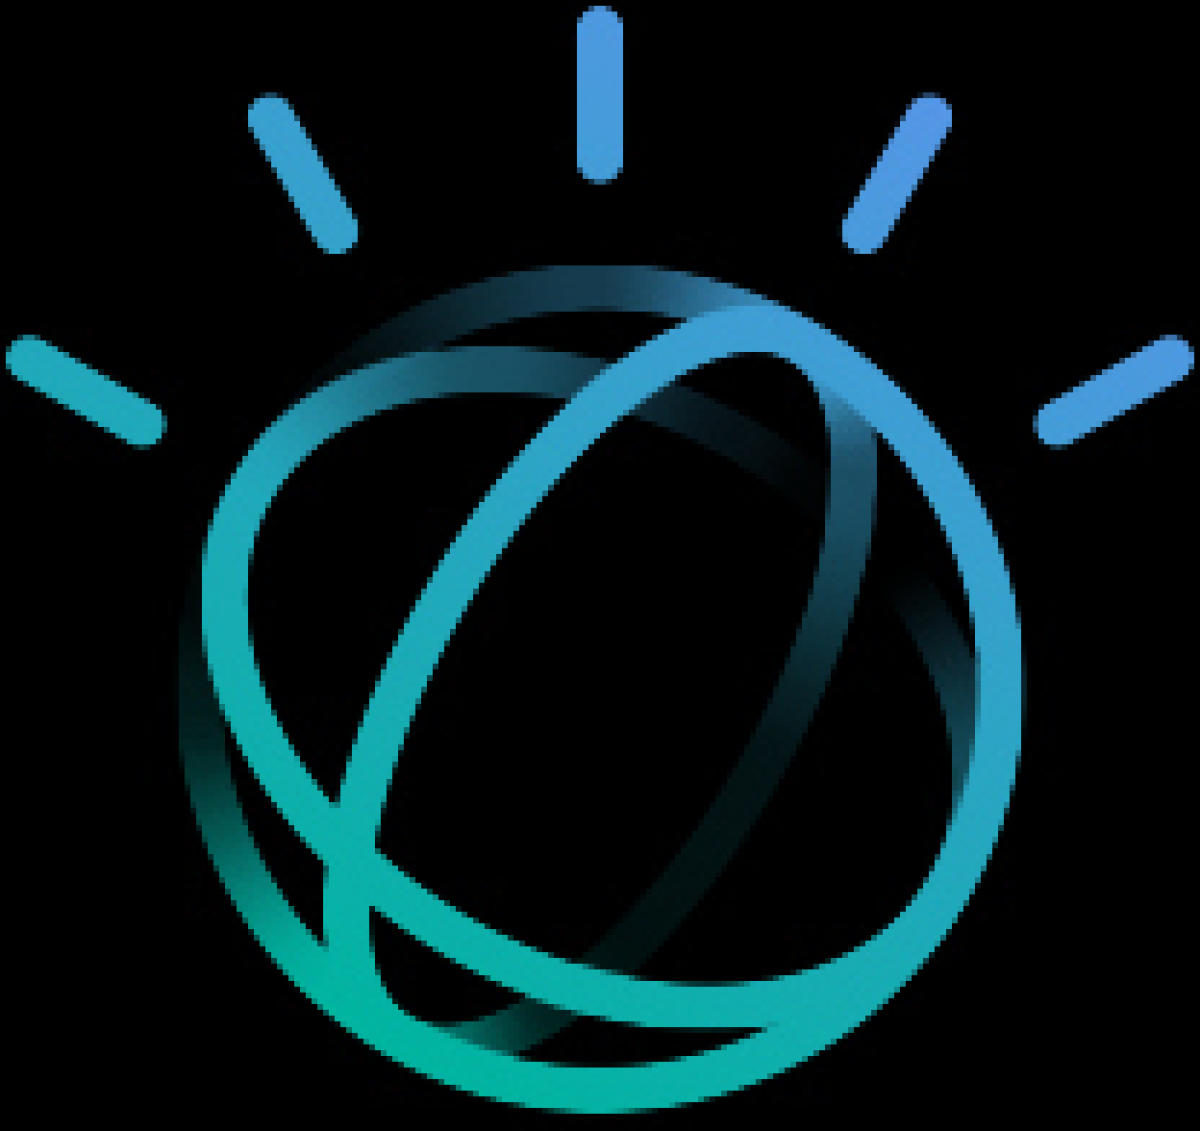 Le logo de Watson.